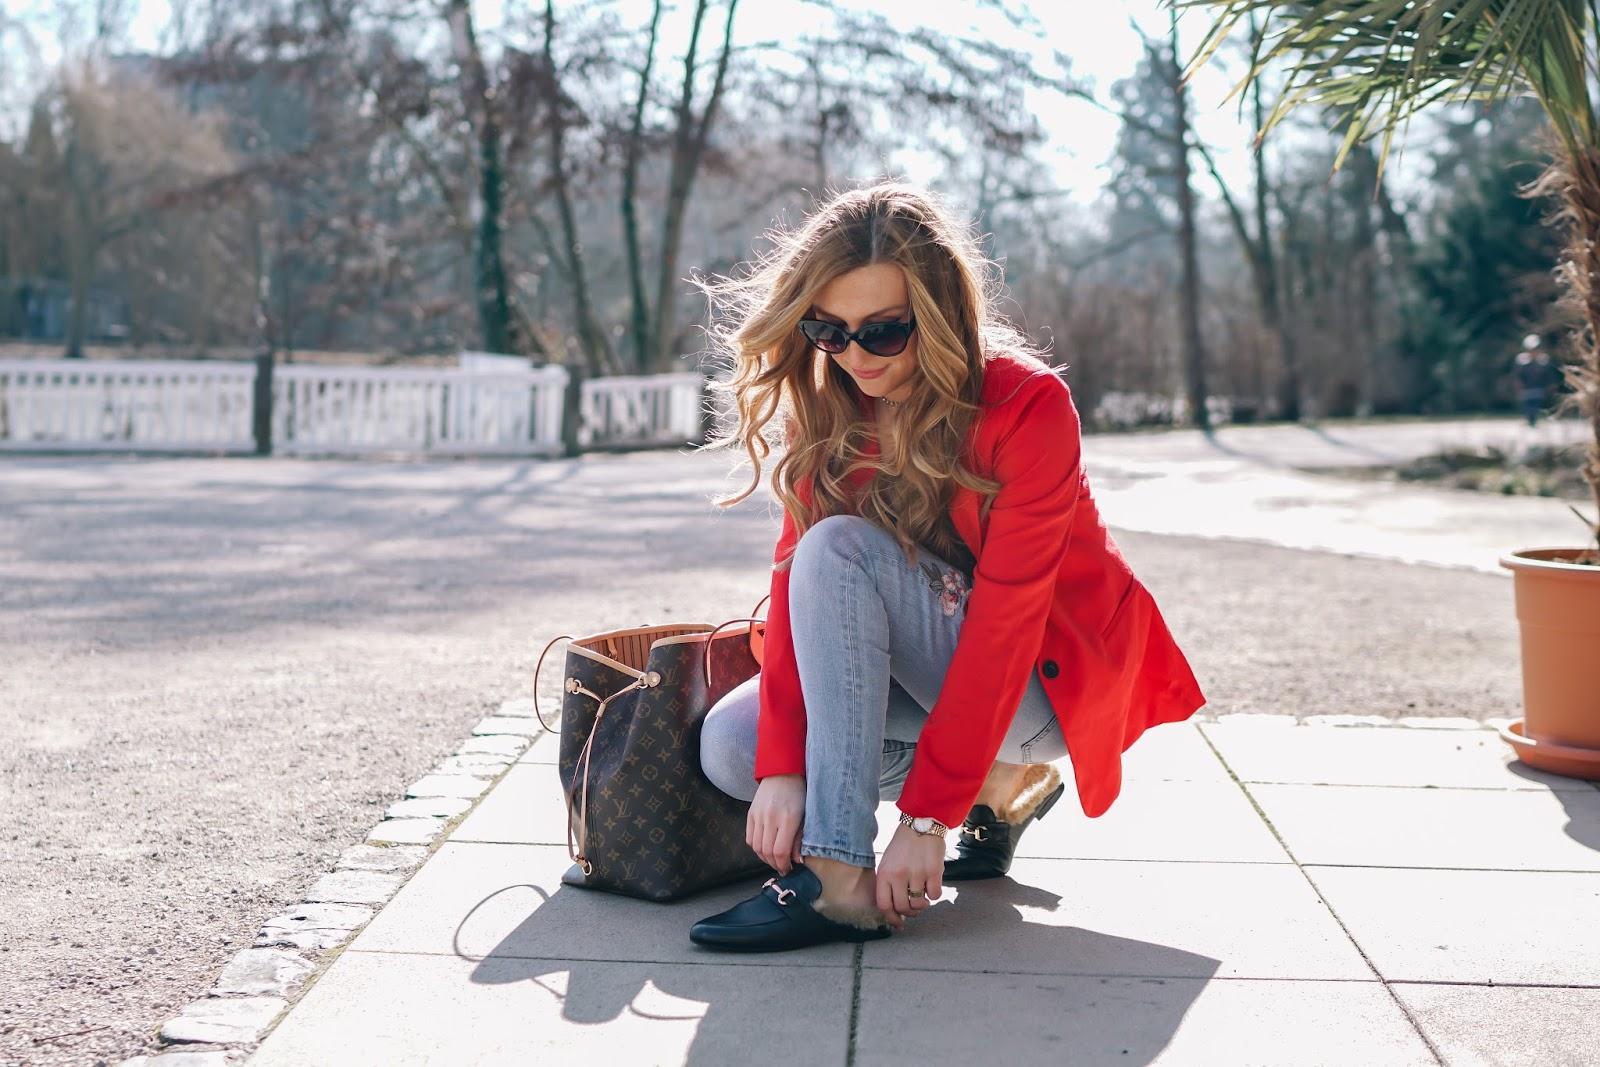 roter-blazer-jeanshose-mit-stickerei-slipper-lokk-like-gucci-louis-vuitton-neverful-gm